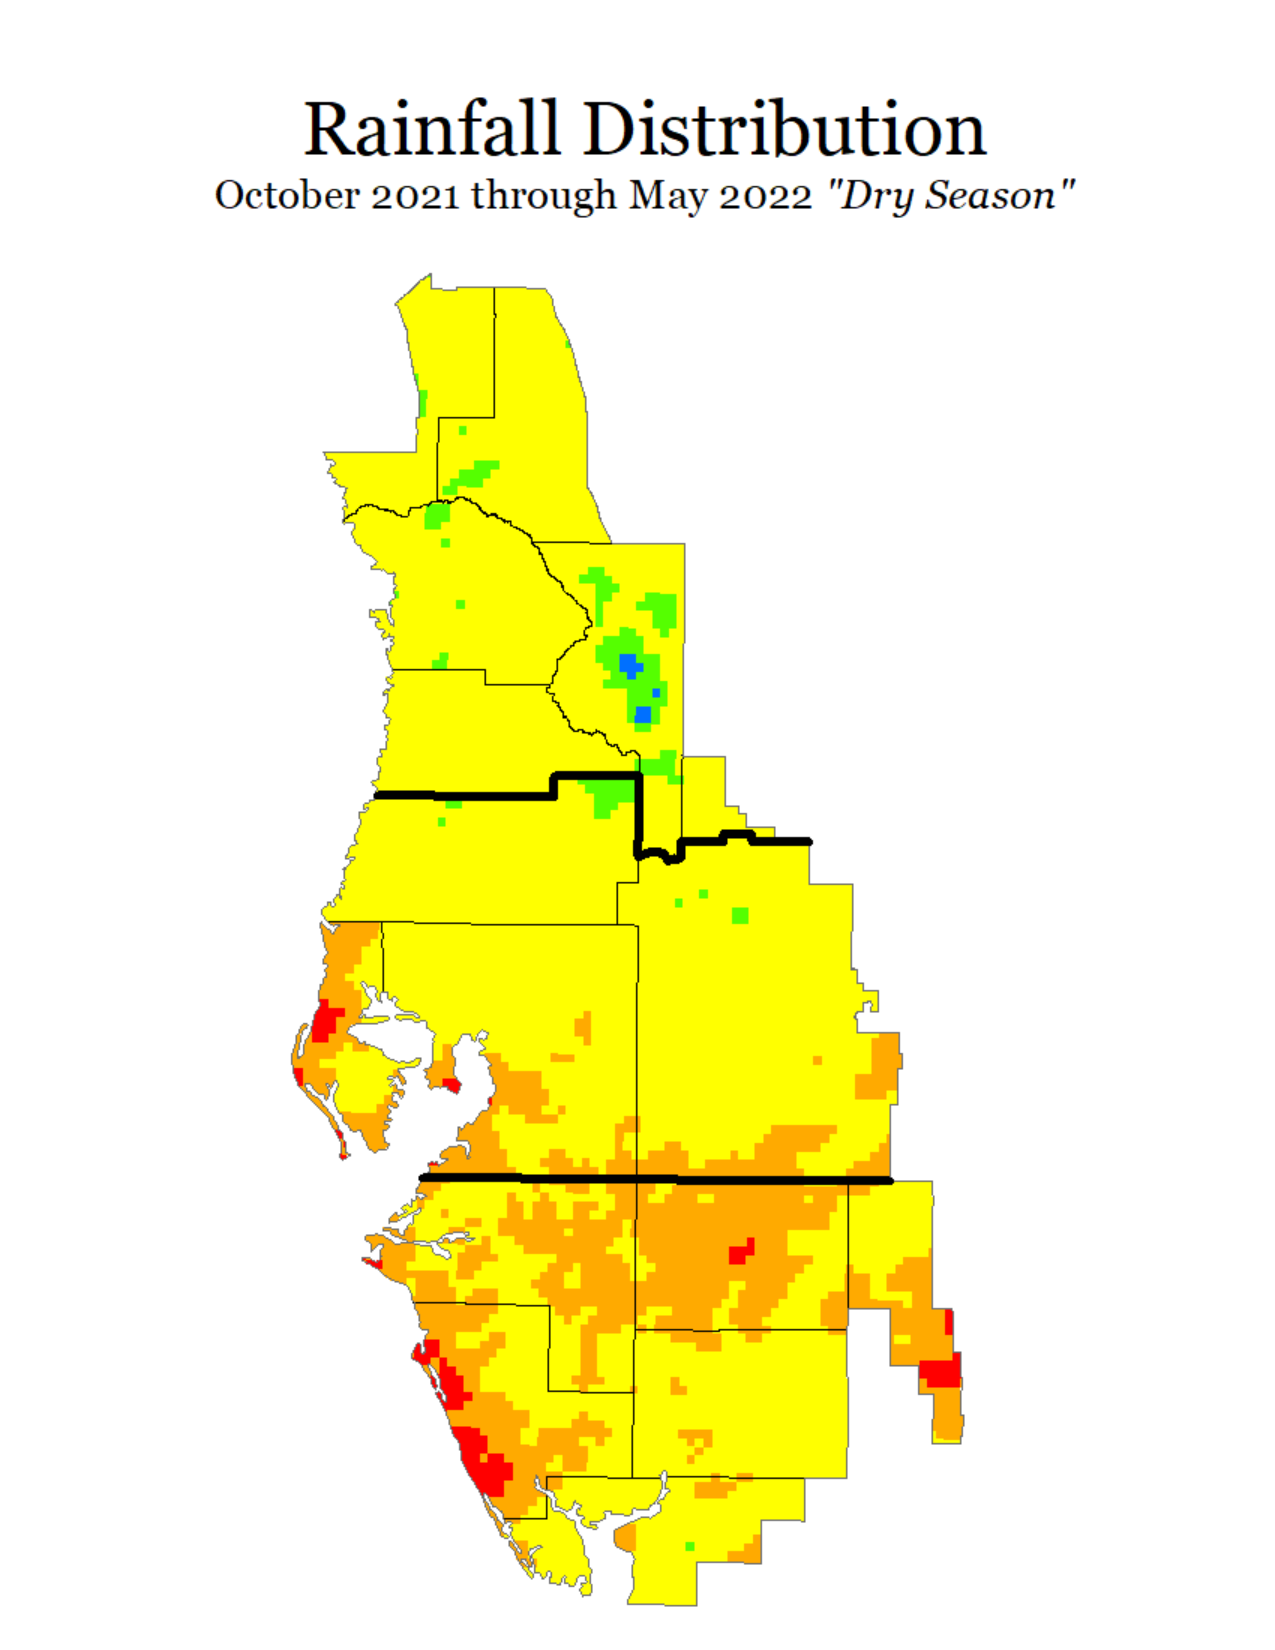 Seasonal Rainfall